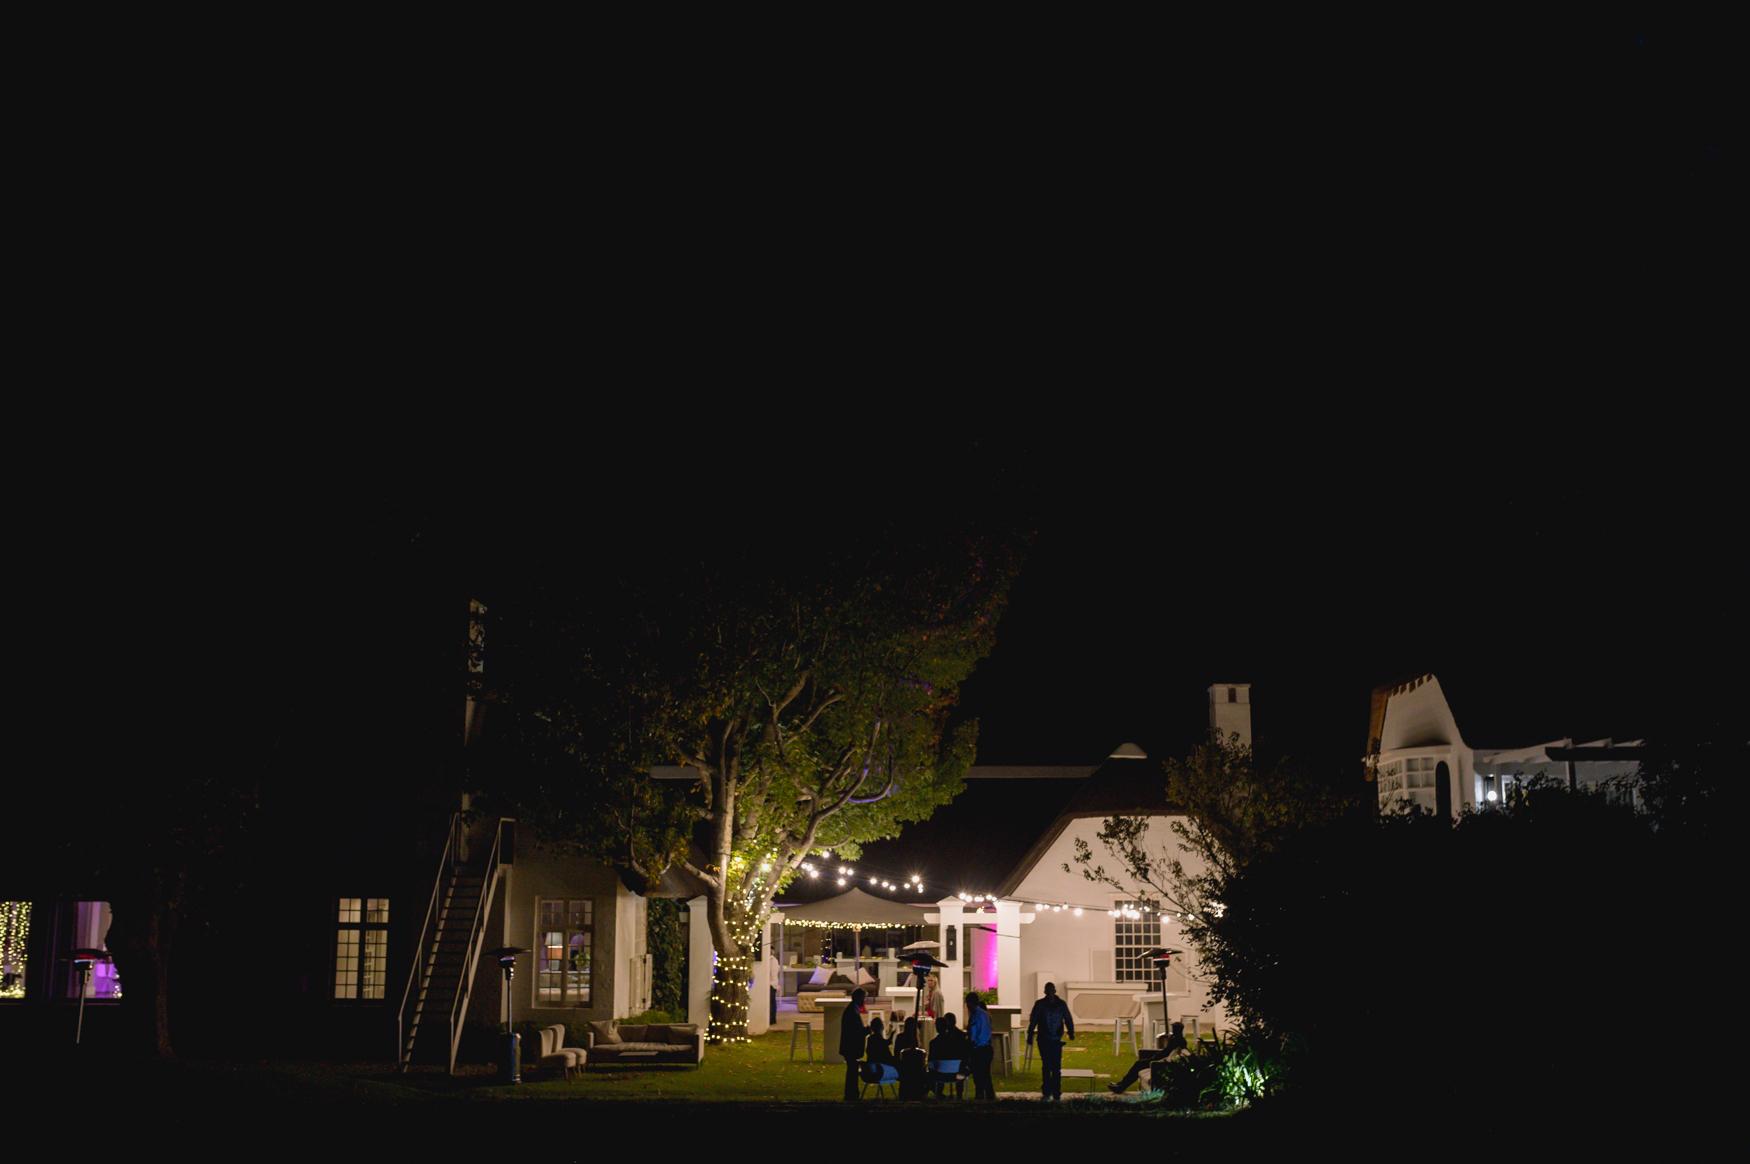 Leon_&_Martine's_Wedding_Photographs_17th_April_2019_@johnhenryweddingphoto_Low_Resolution_Web-609.JPG